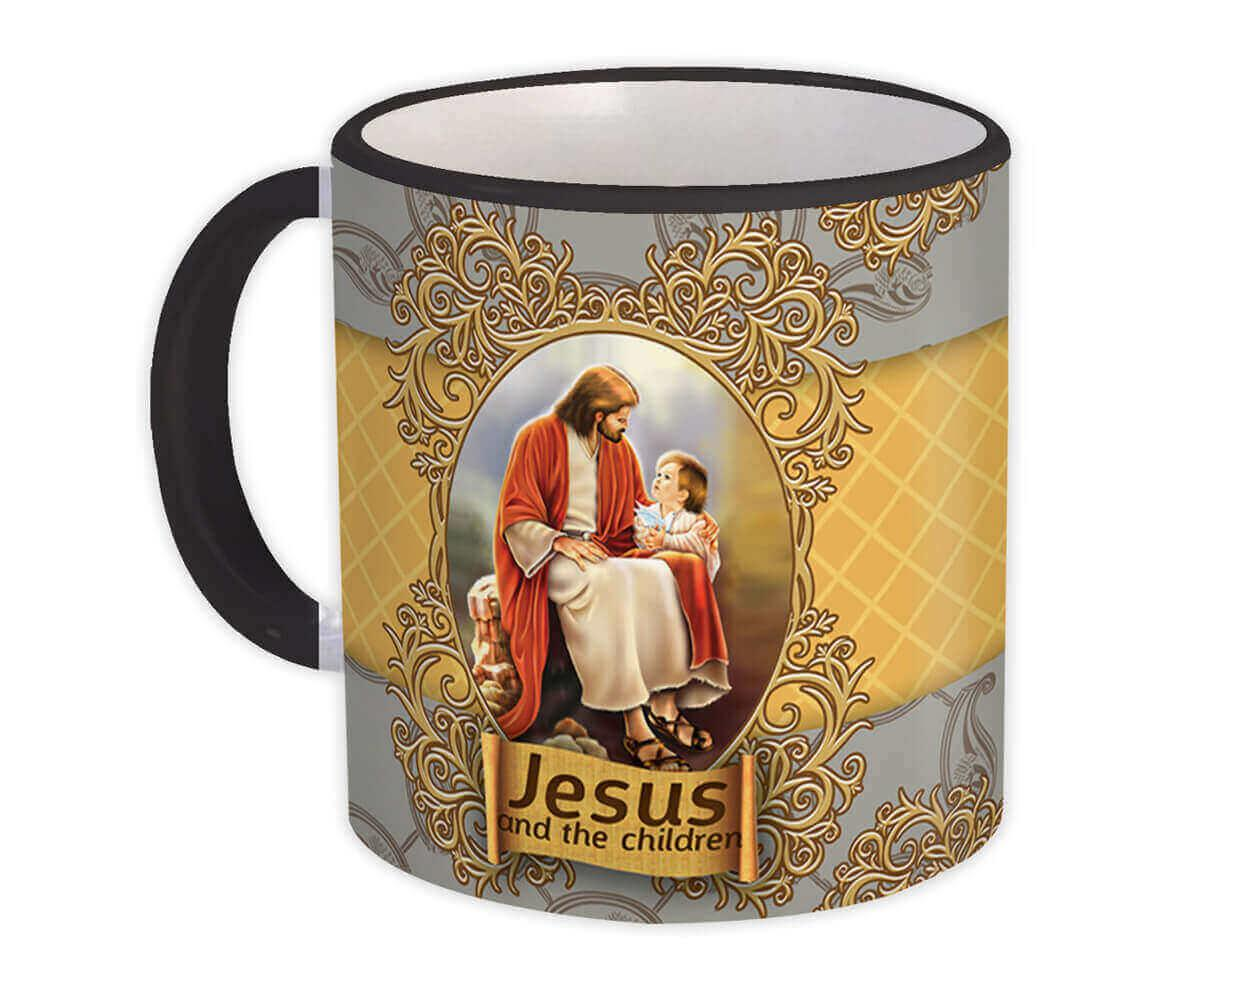 Jesus and the Children : Gift Mug Catholic Religious Religion Classic Faith